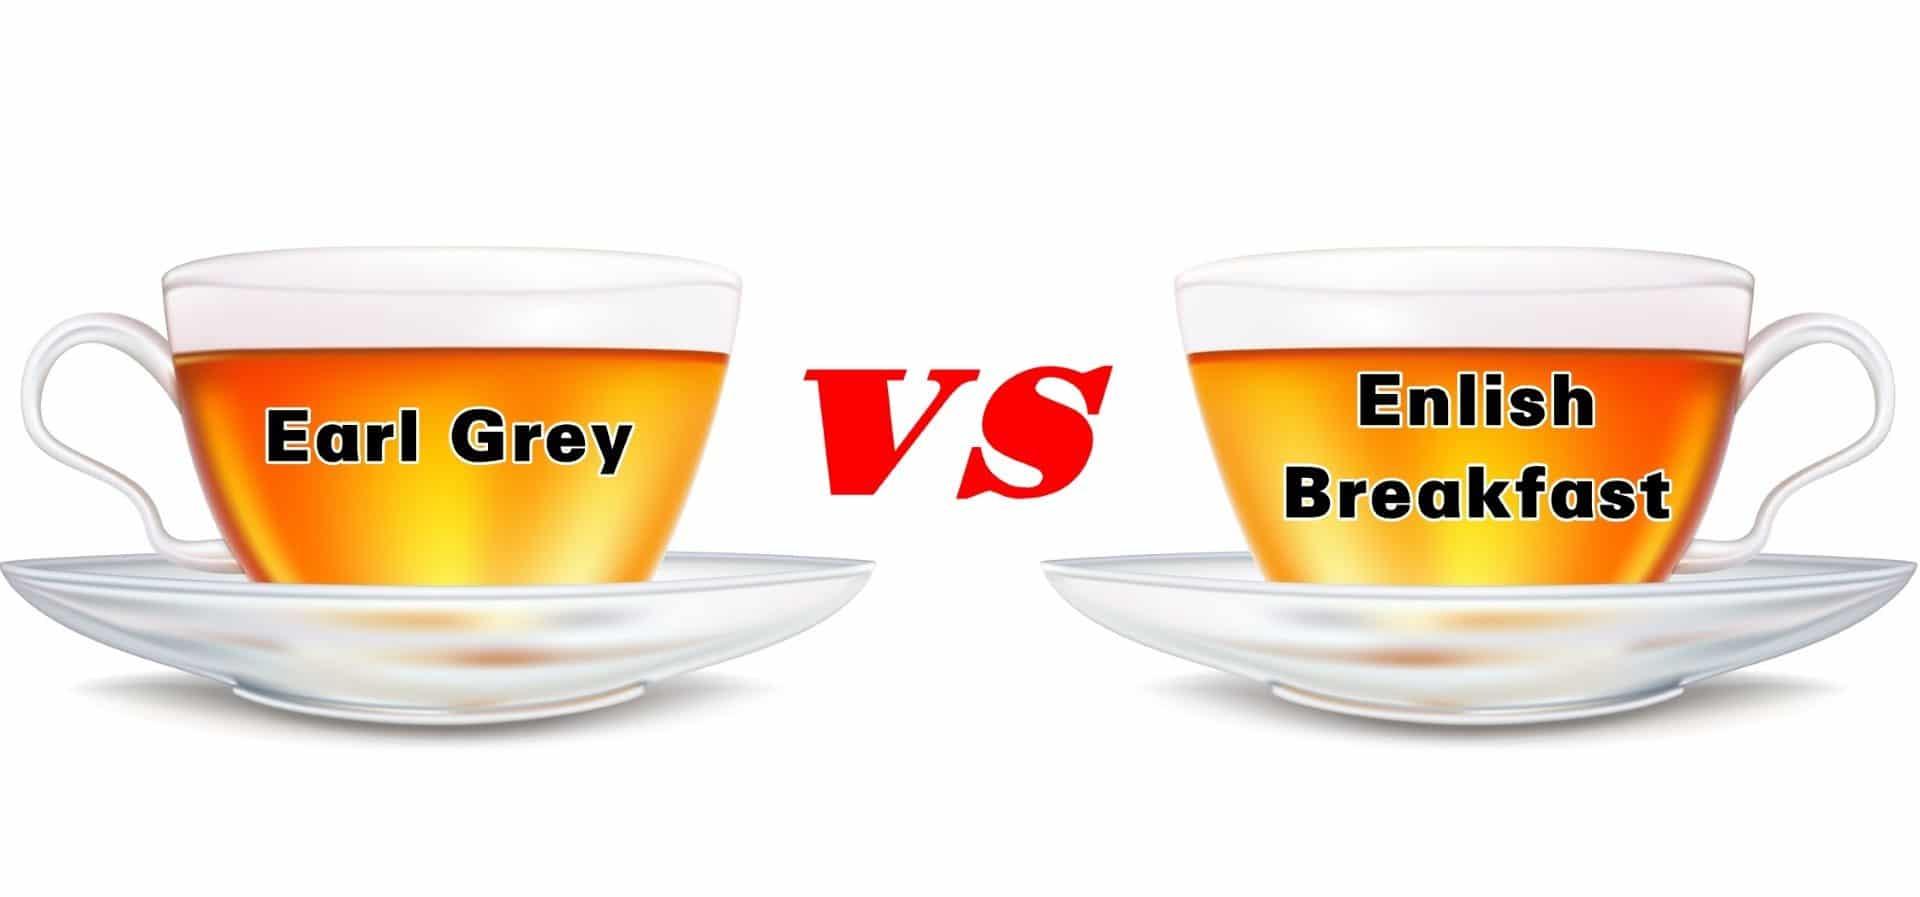 EARL GREY VS ENGLISH BREAKFAST